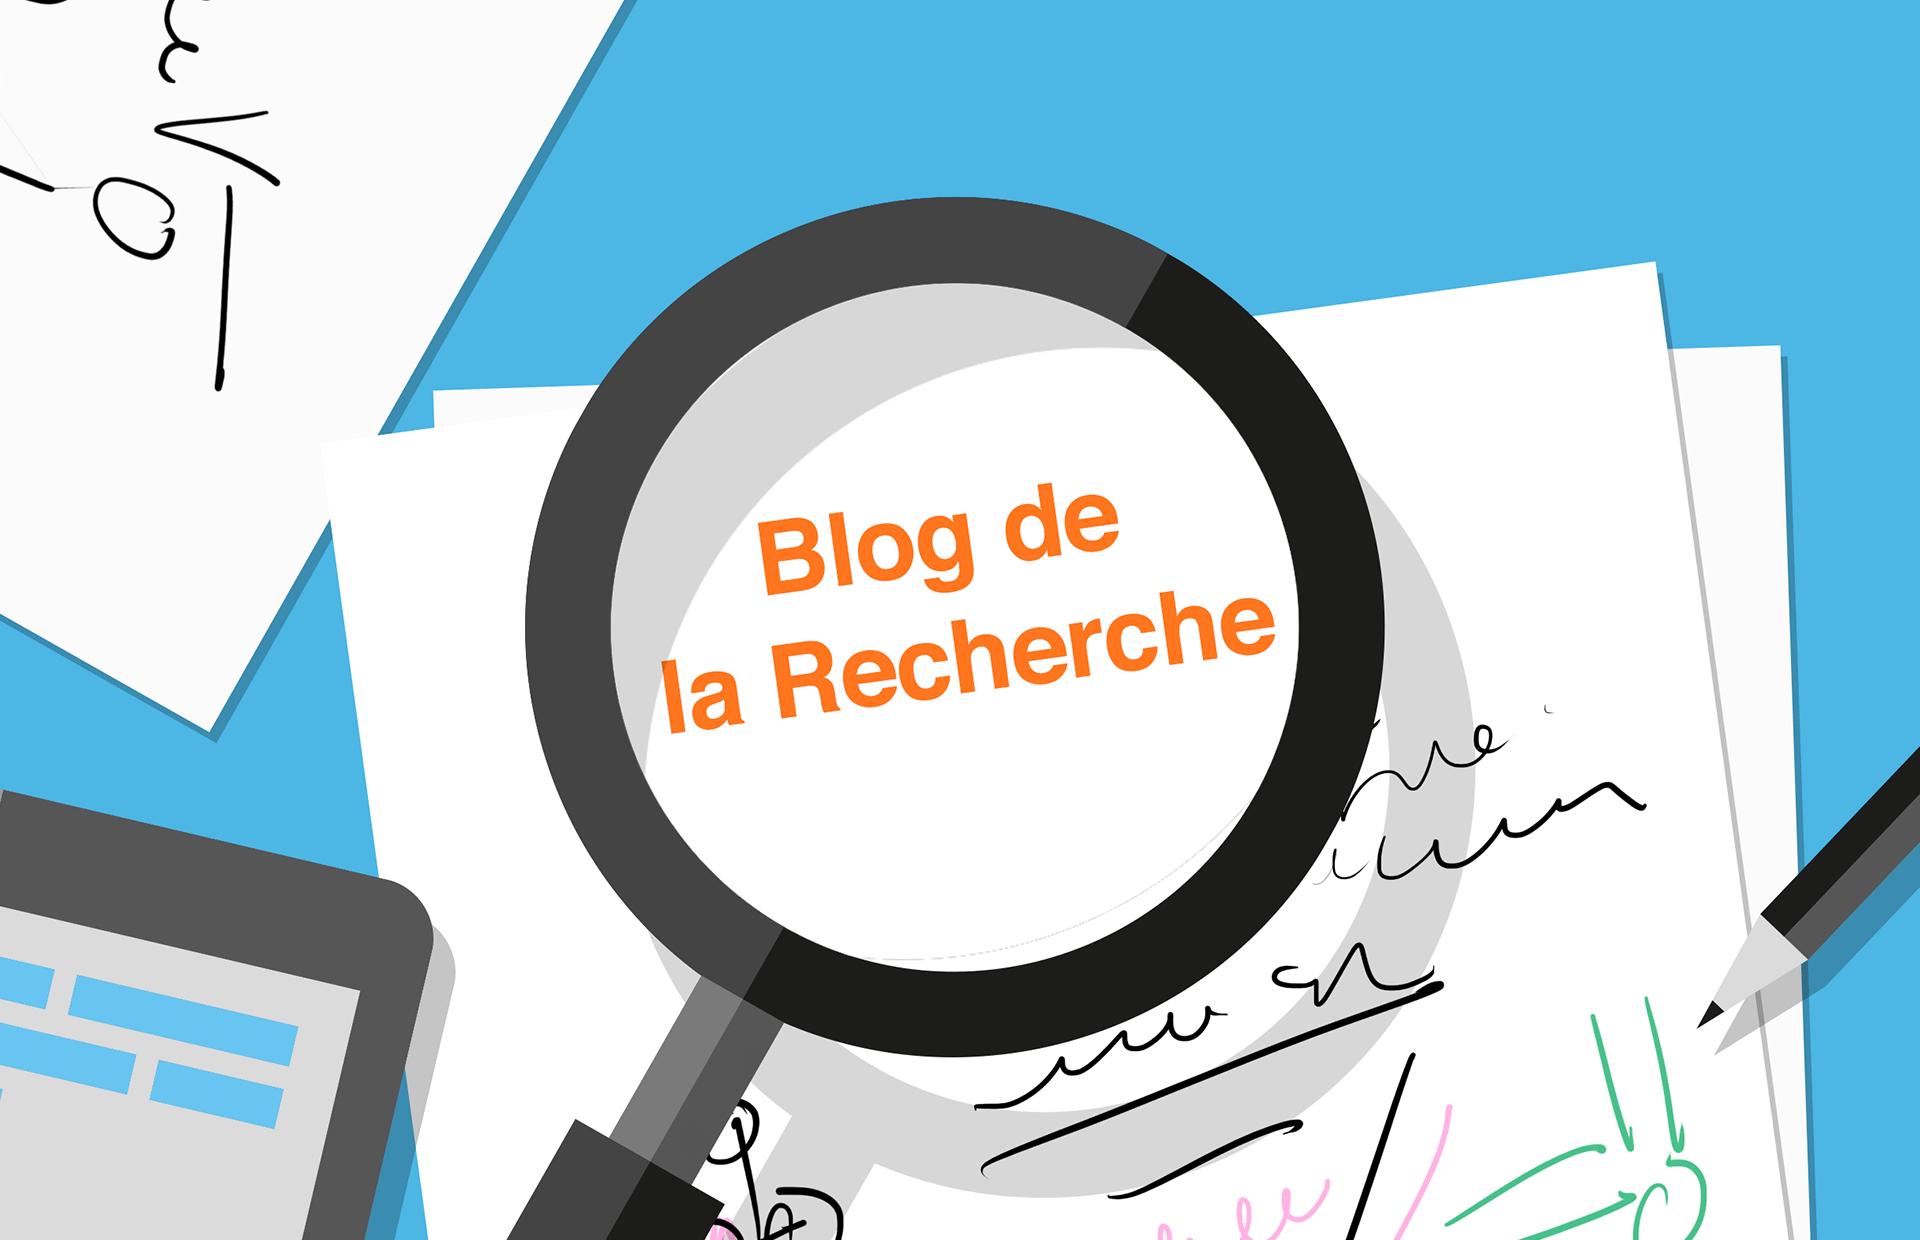 Blog de la recherche